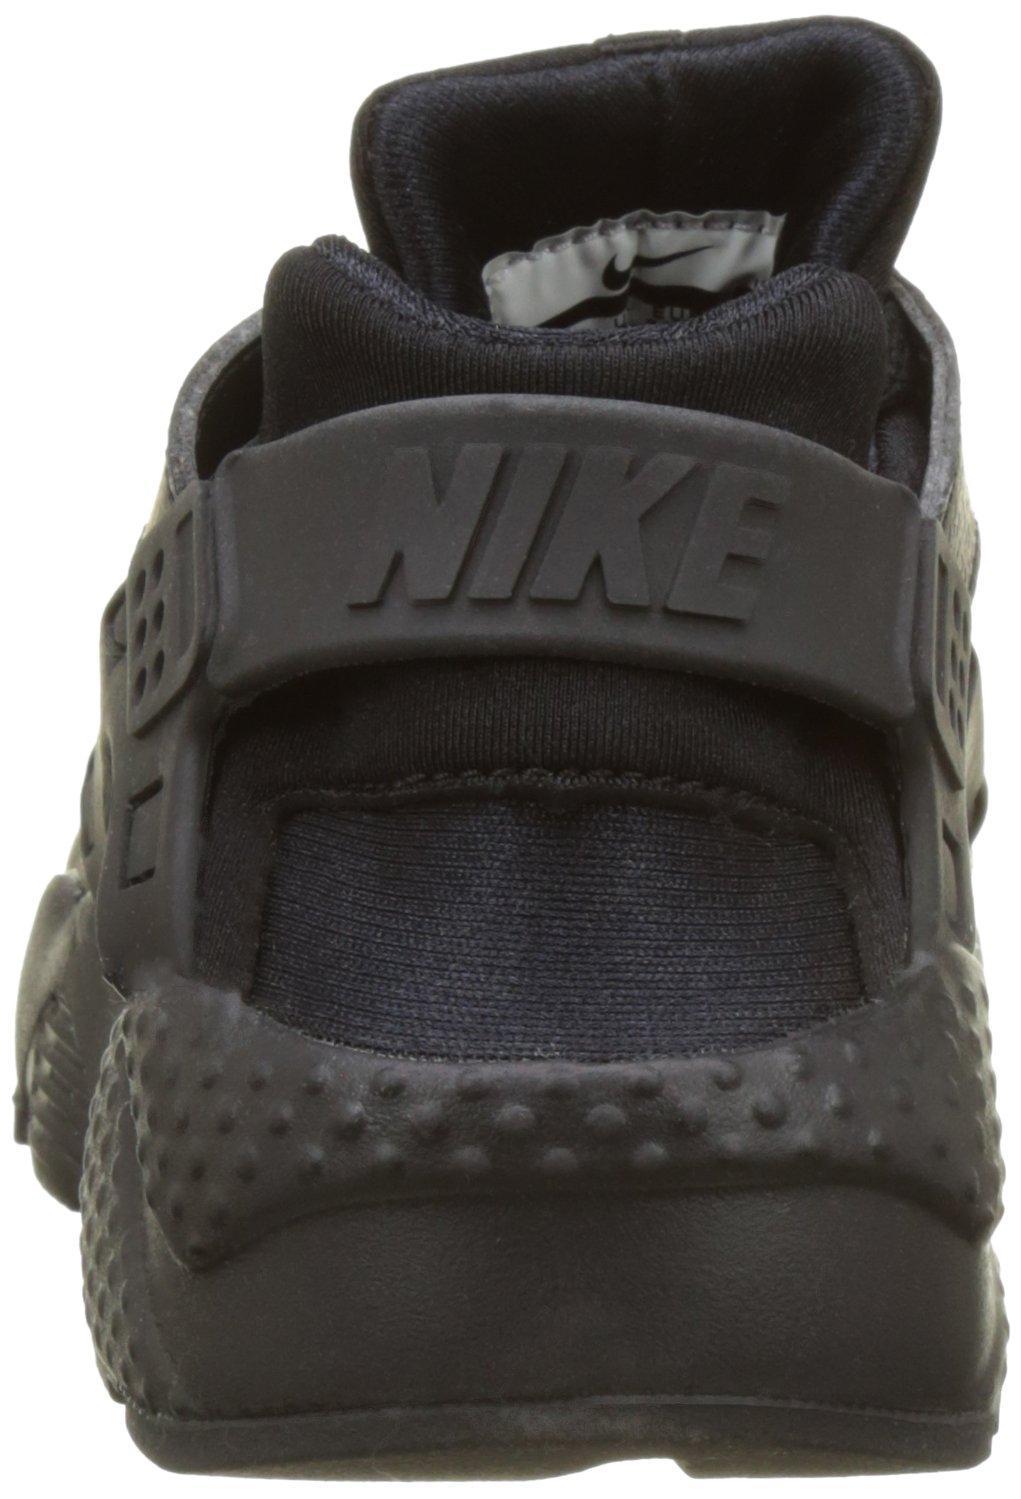 7174KFuPvSL - Nike Huarache Run (GS), Boys' Running Shoes